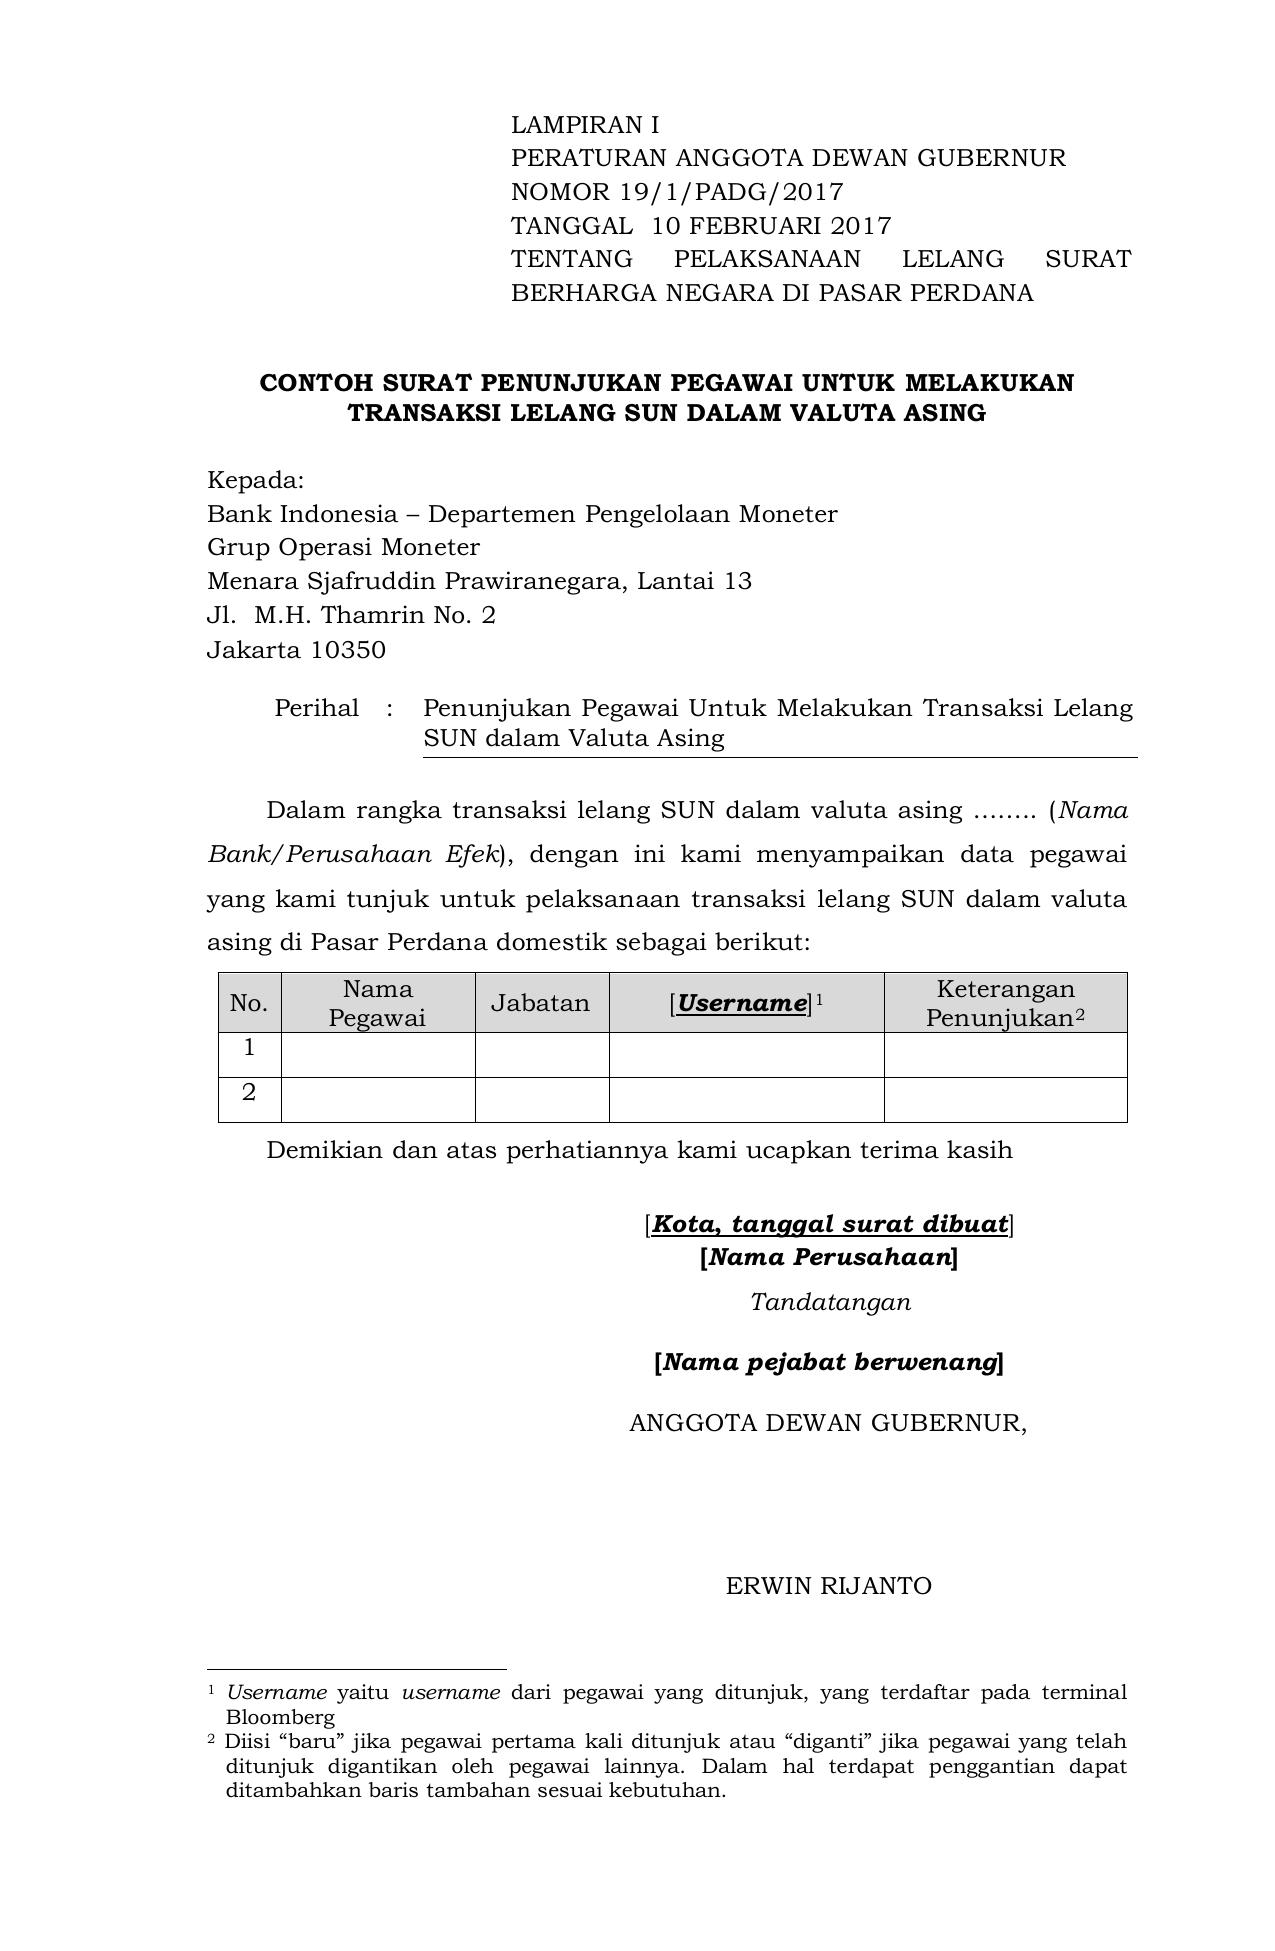 Contoh Surat Penunjukan Pegawai